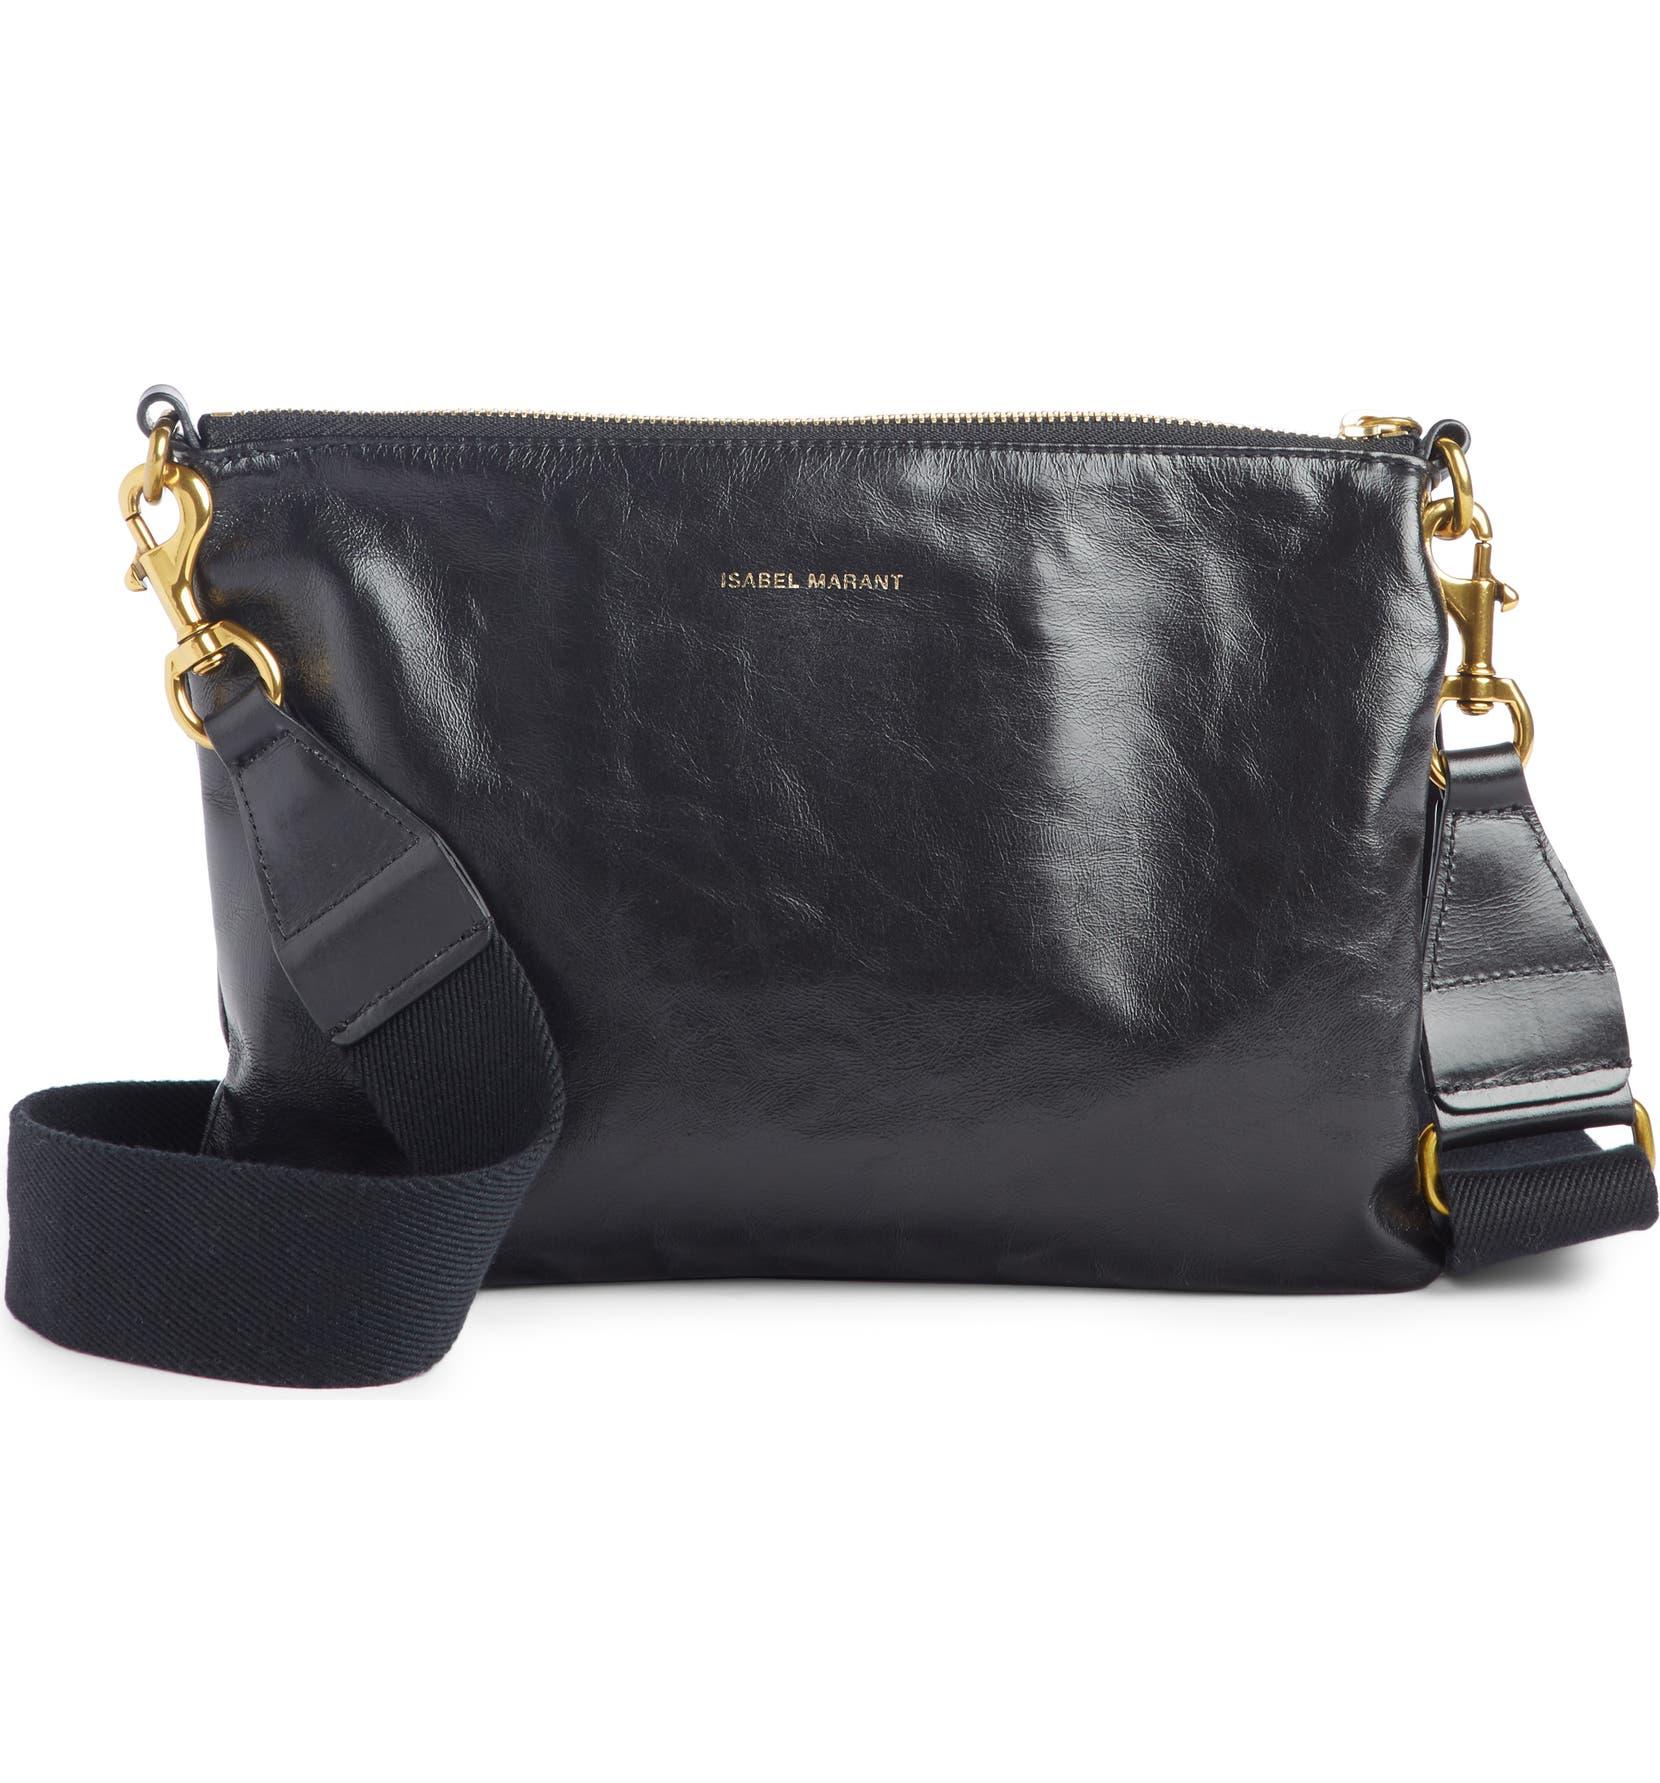 Isabel Marant Nessah Leather Crossbody Bag   Nordstrom e632151874